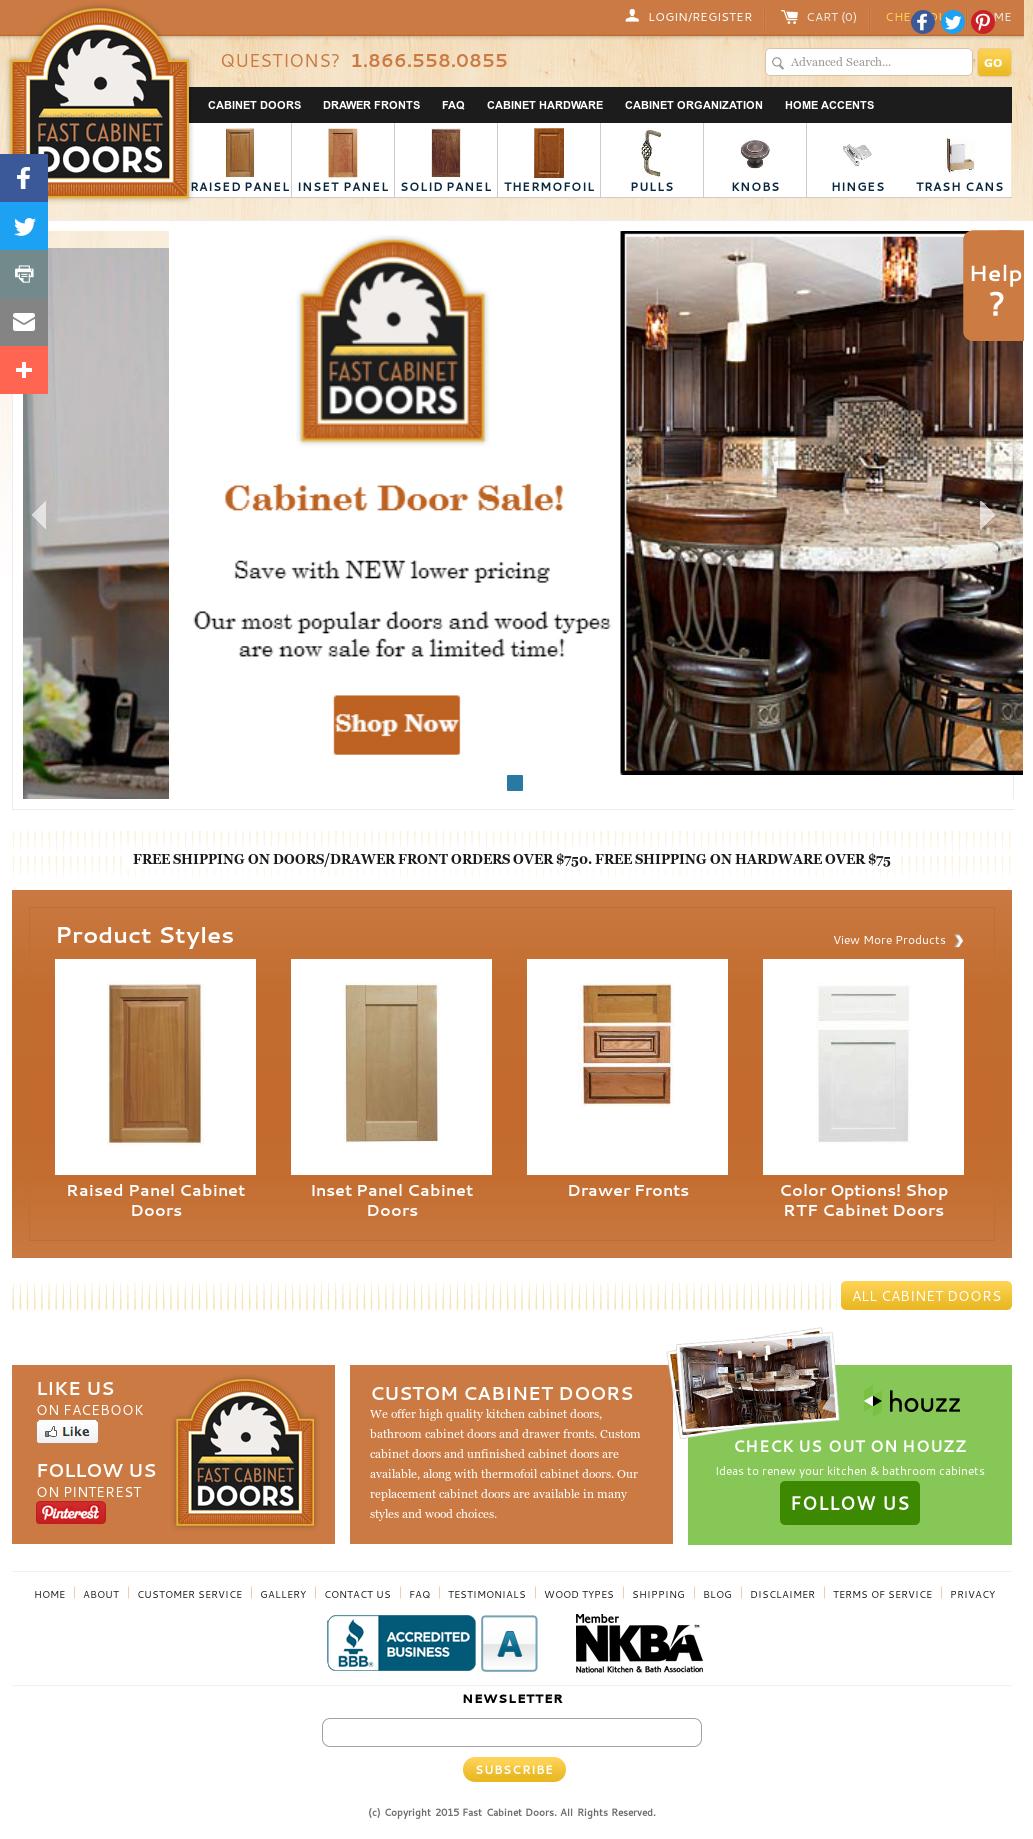 Best Fast Cabinet Doors Decoration